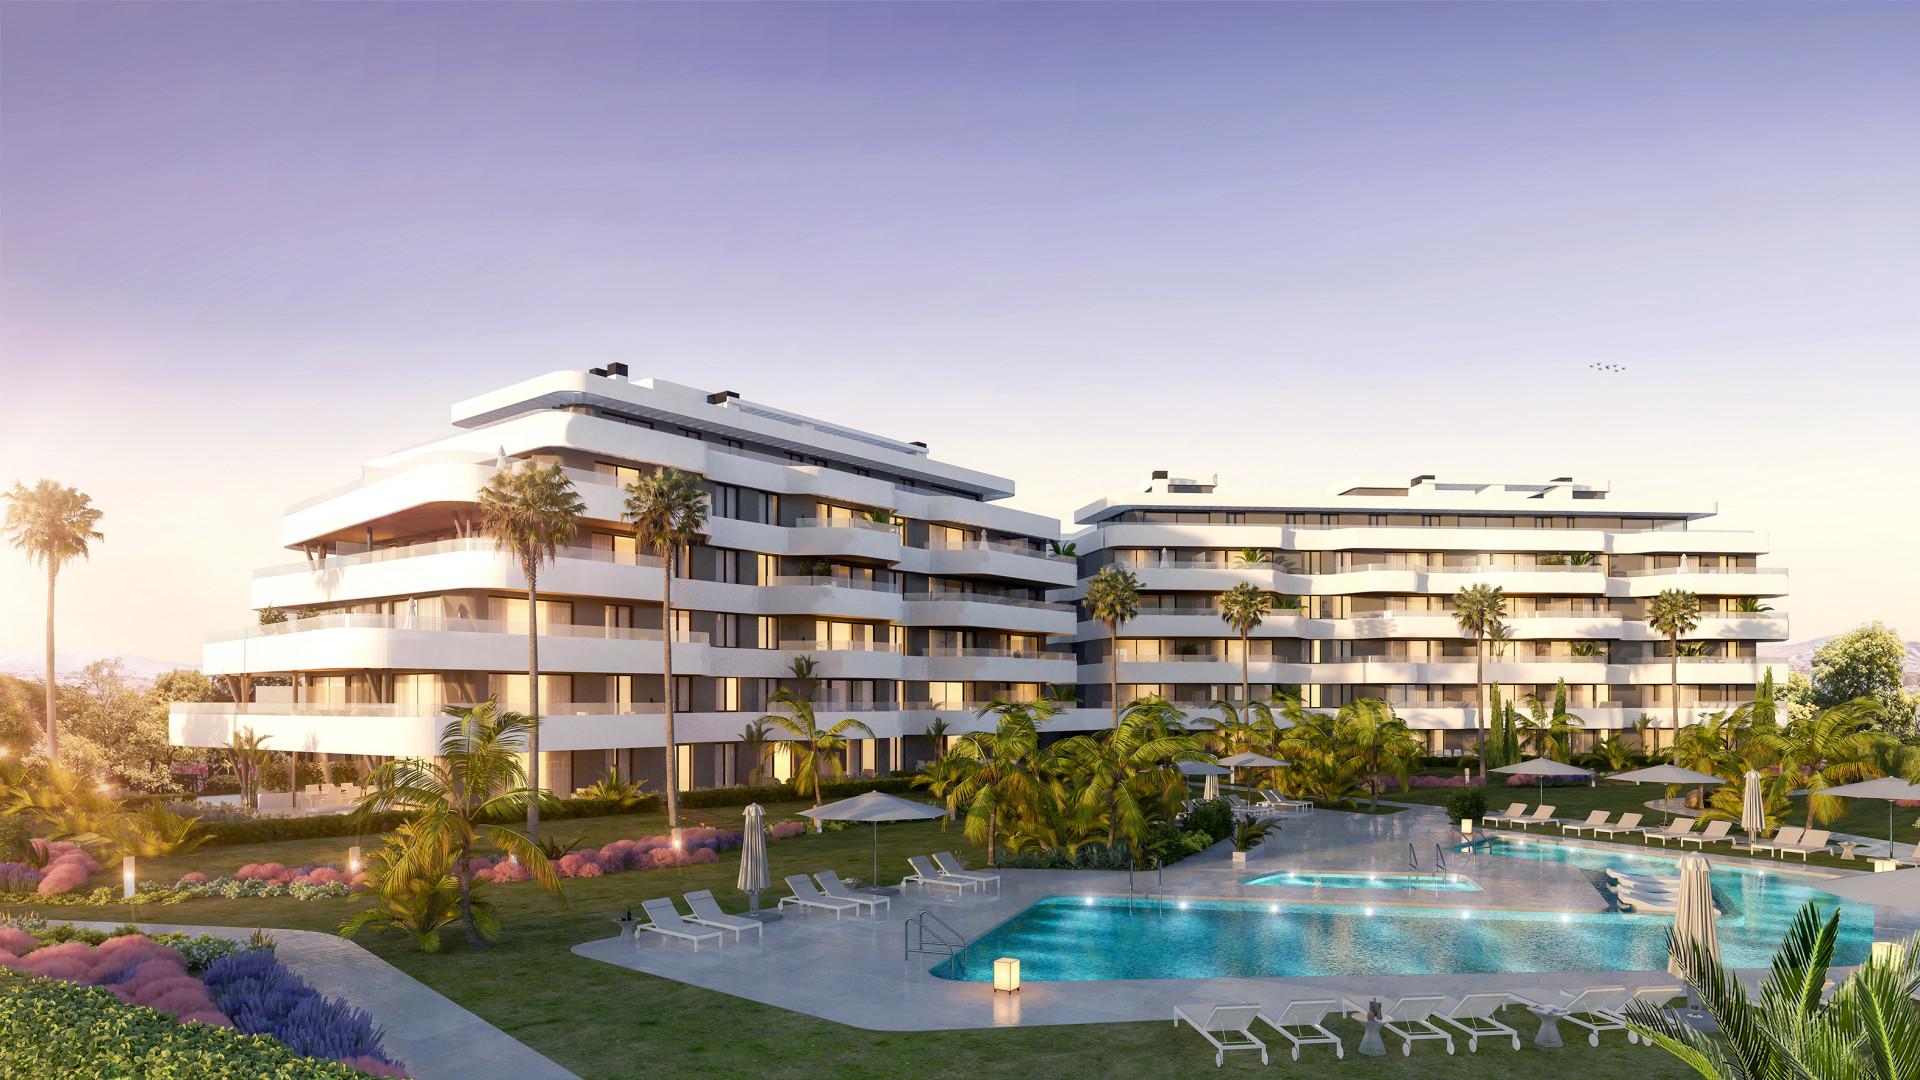 New modern apartments first line beach in Torremolinos